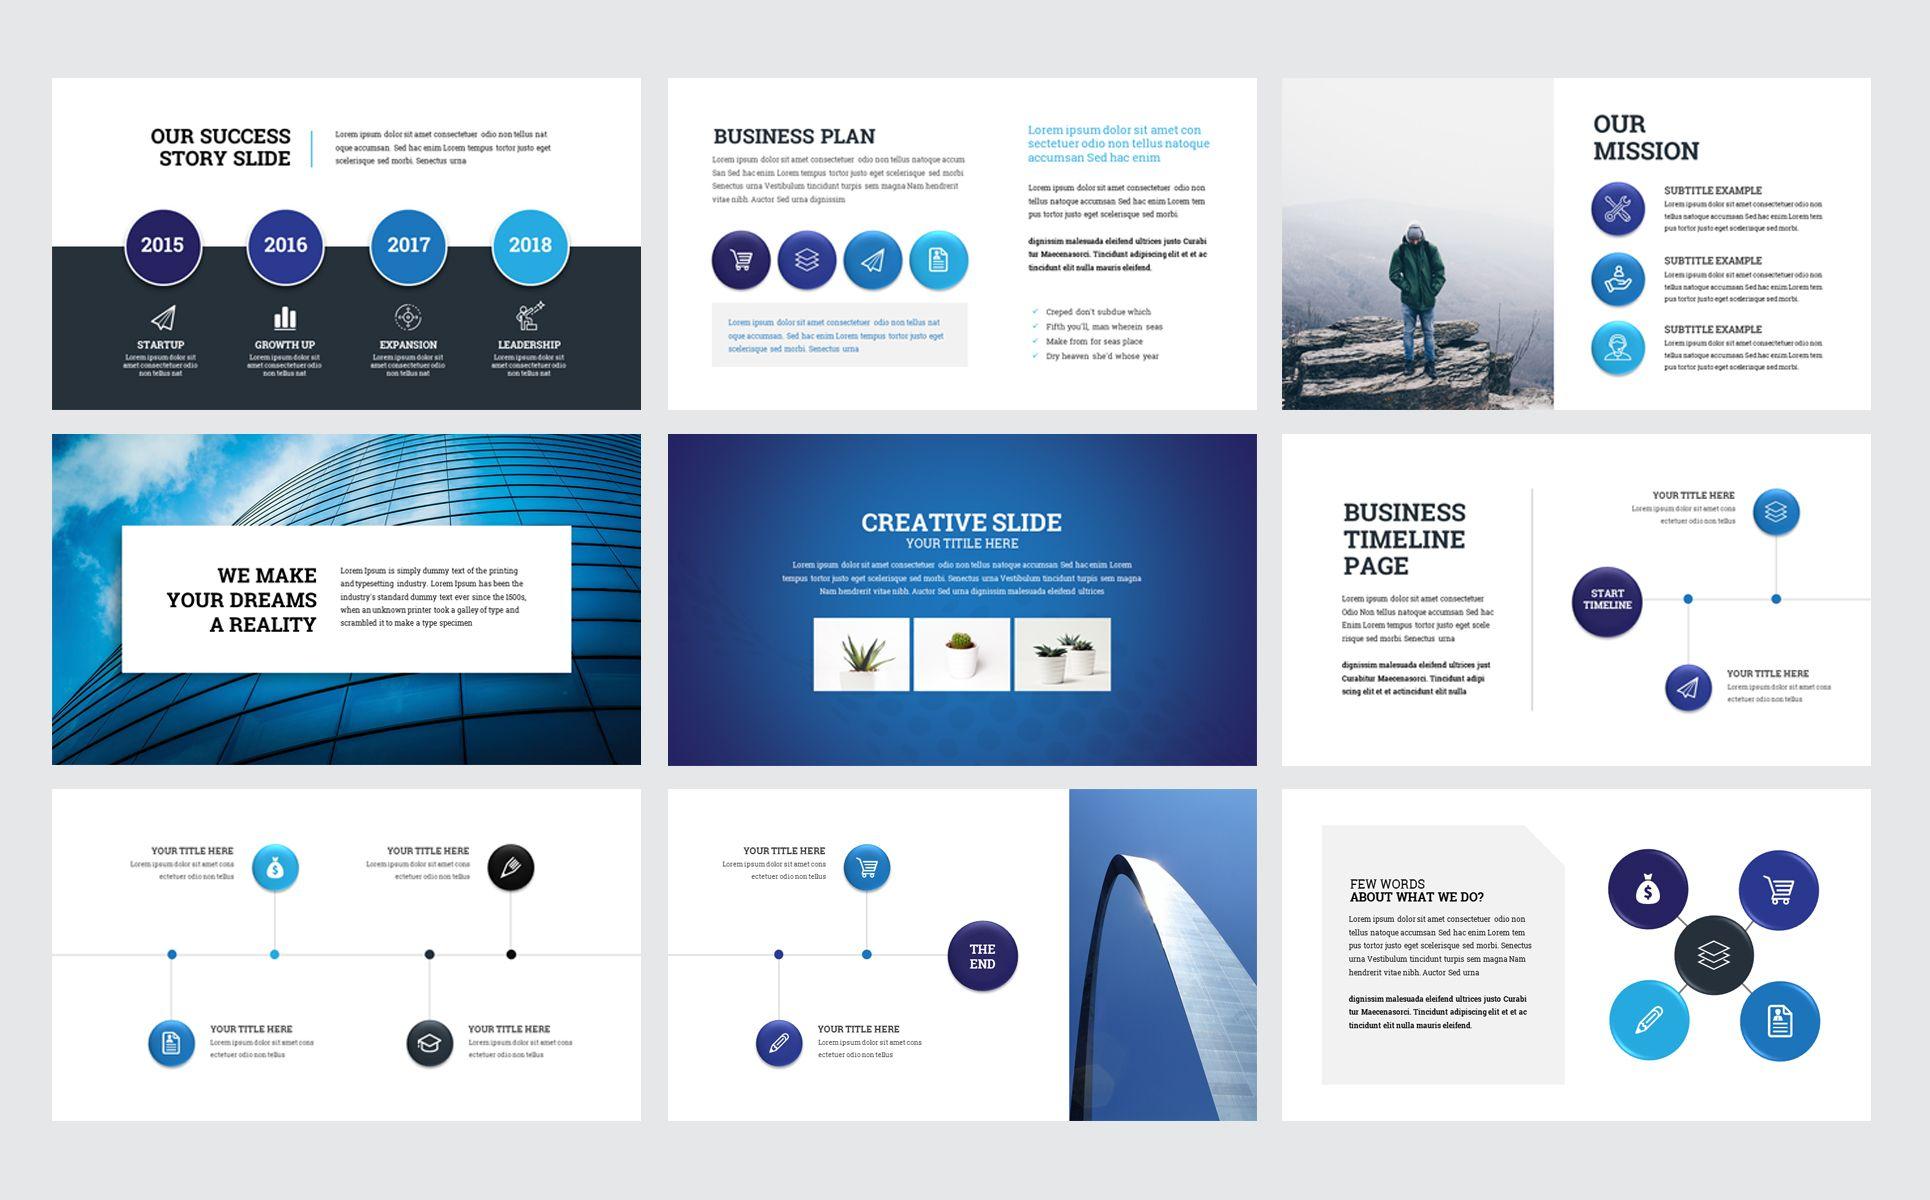 Brand Business Presentation Powerpoint Template Business Brand Presentation Template Business Presentation Business Branding Social Media Design Graphics Ppt templates for business presentation